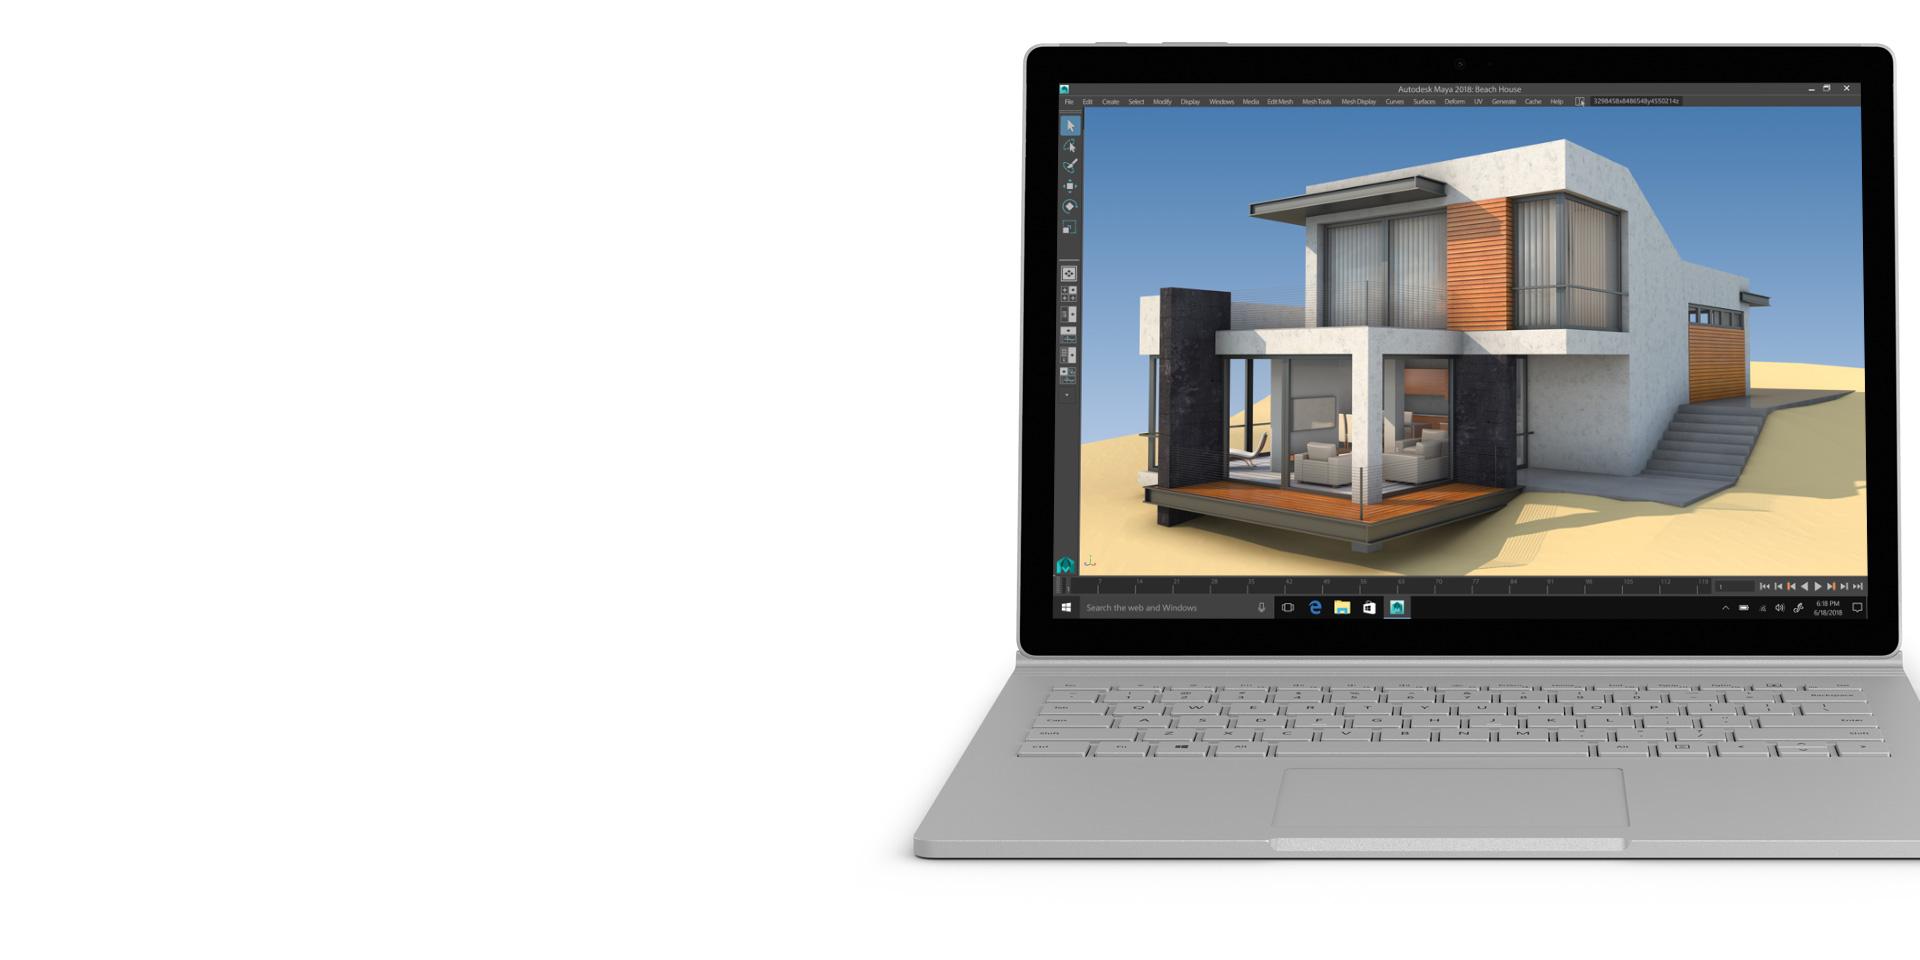 Autodesk Maya no ecrã do Surface Book 2